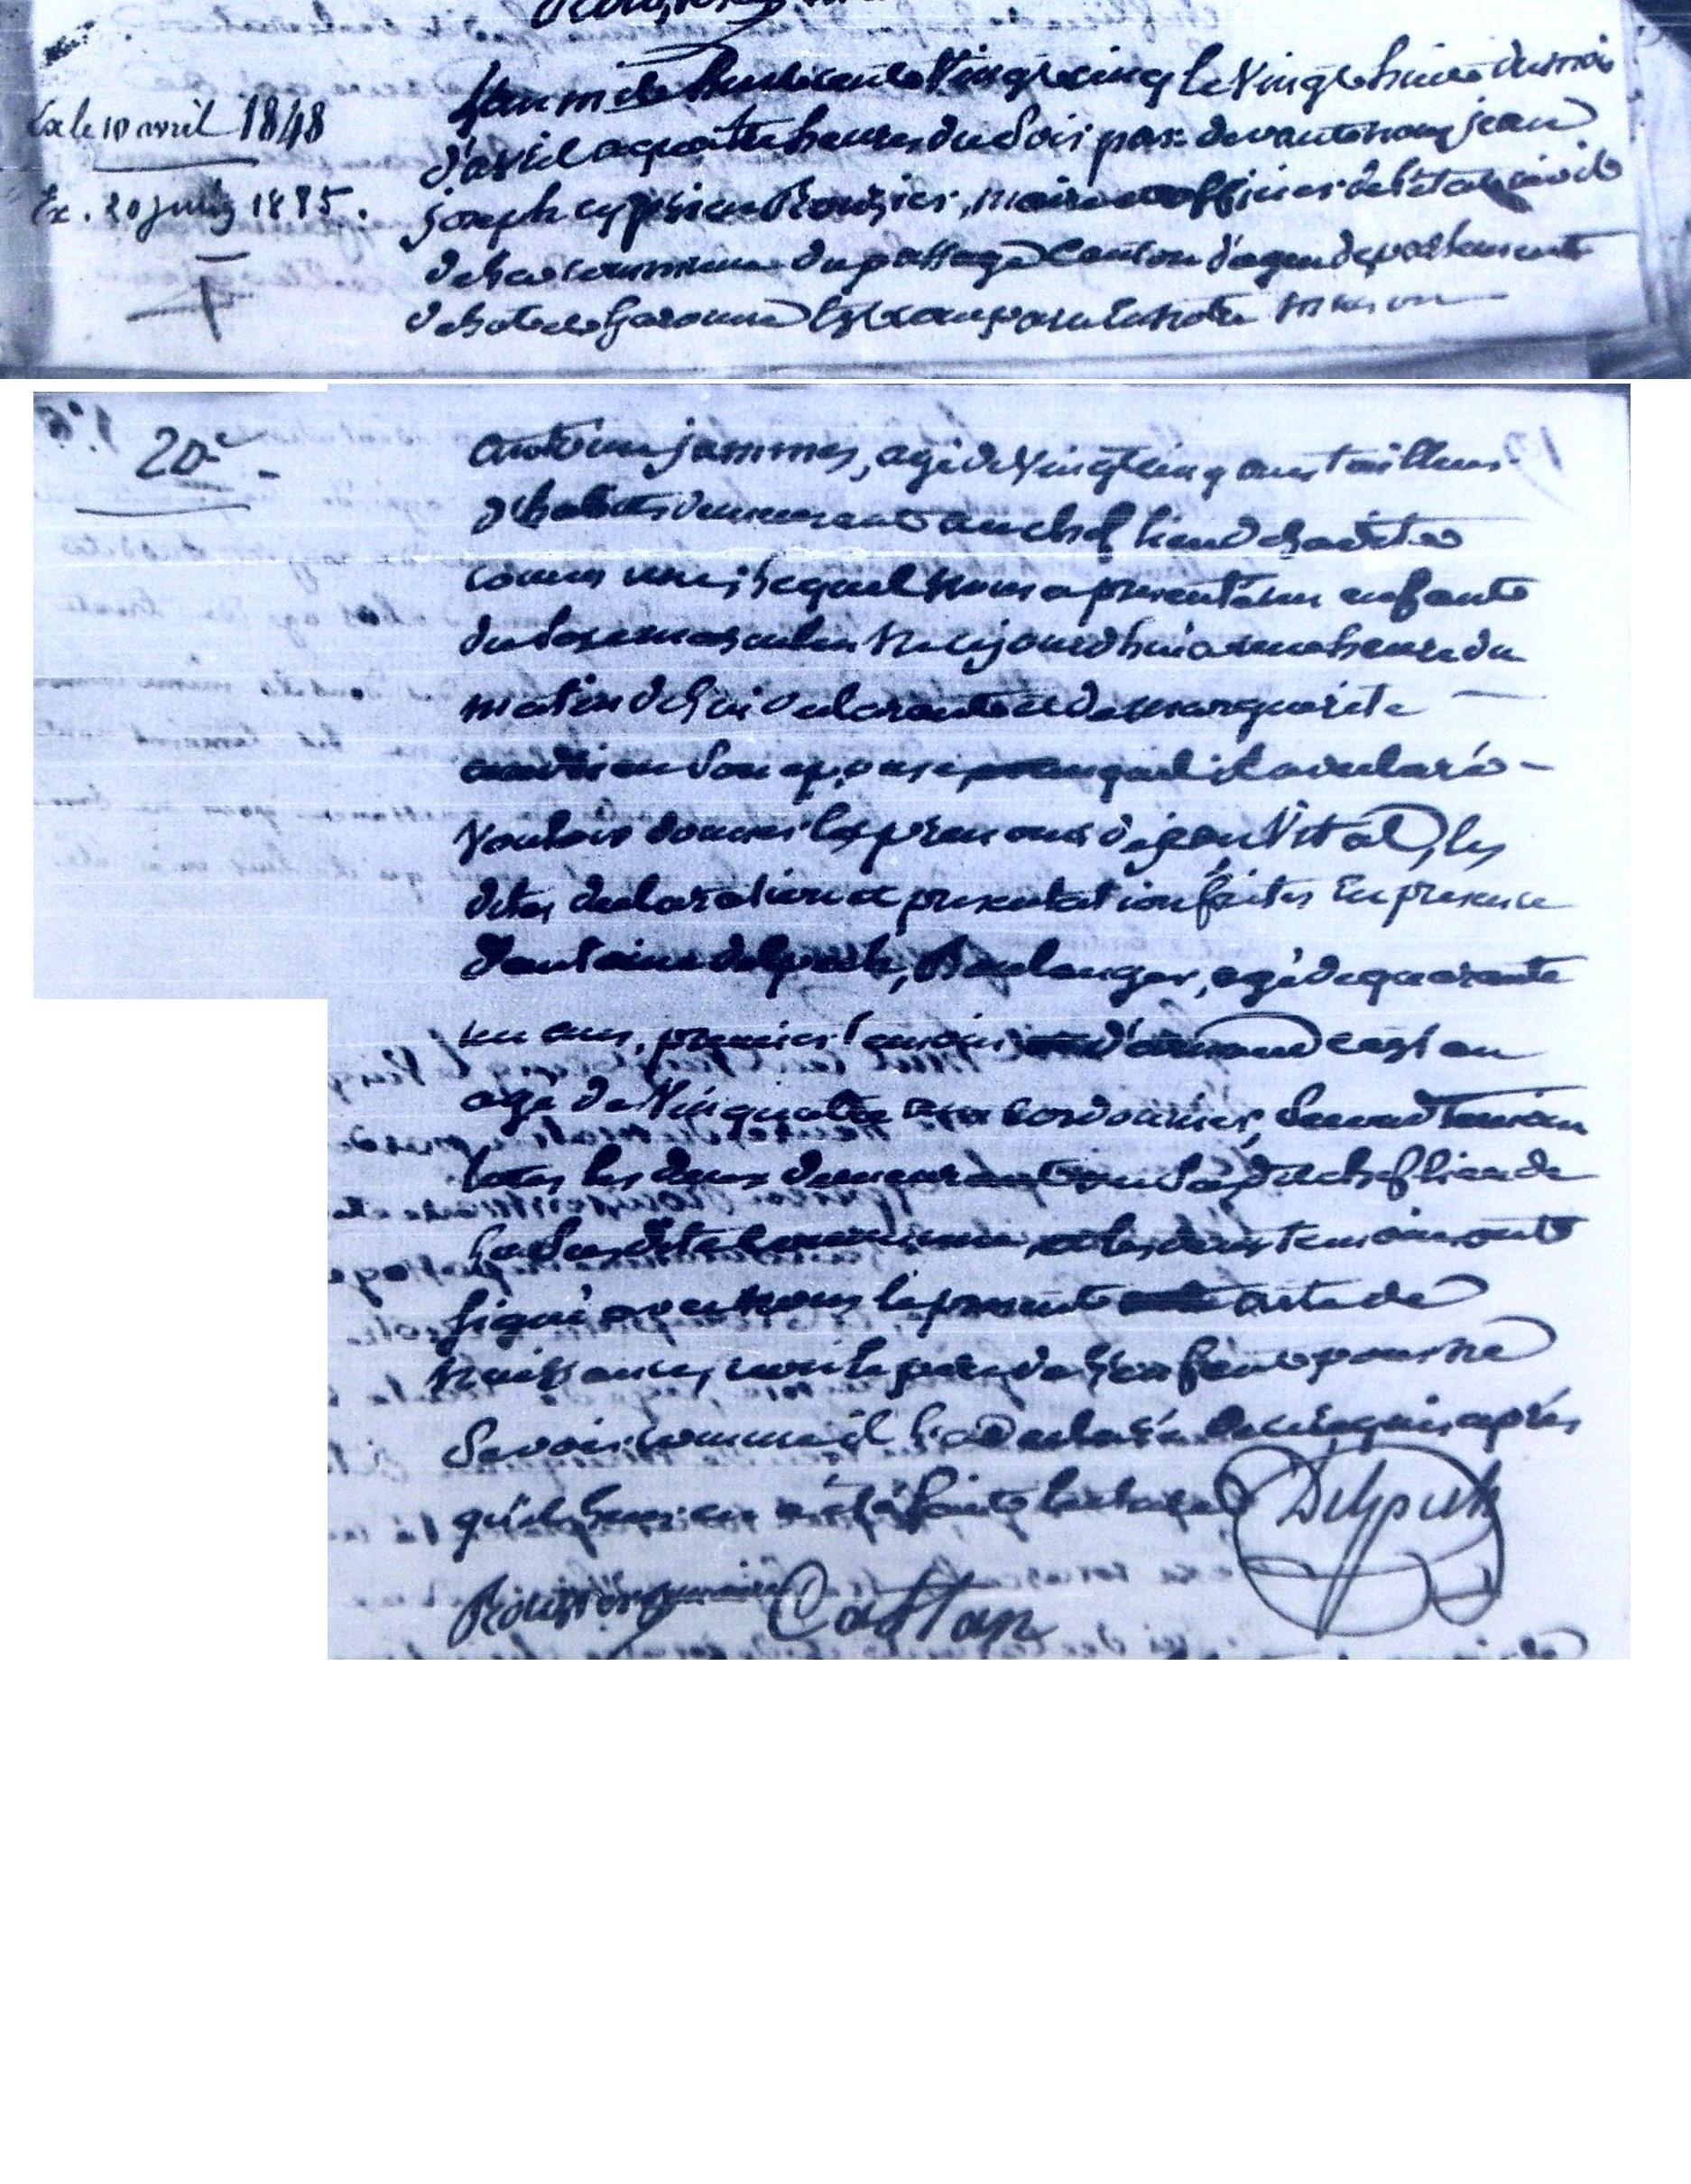 Filejammes Jean Vital Birth Certificate 1825g Wikimedia Commons